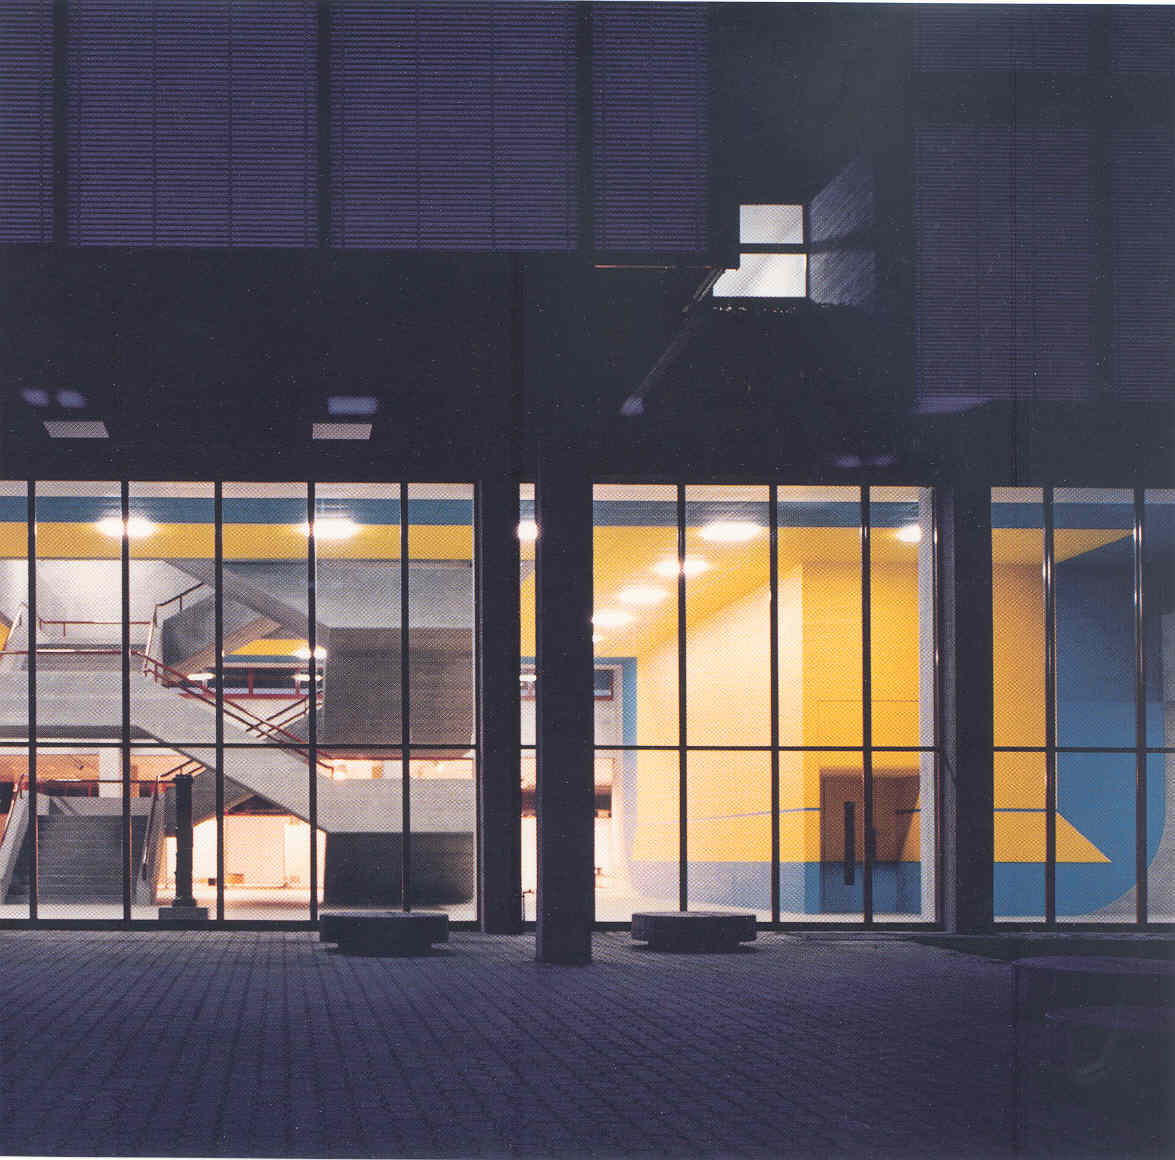 Georg Karl Pfahler - Kunst am Bau - Eingangshalle